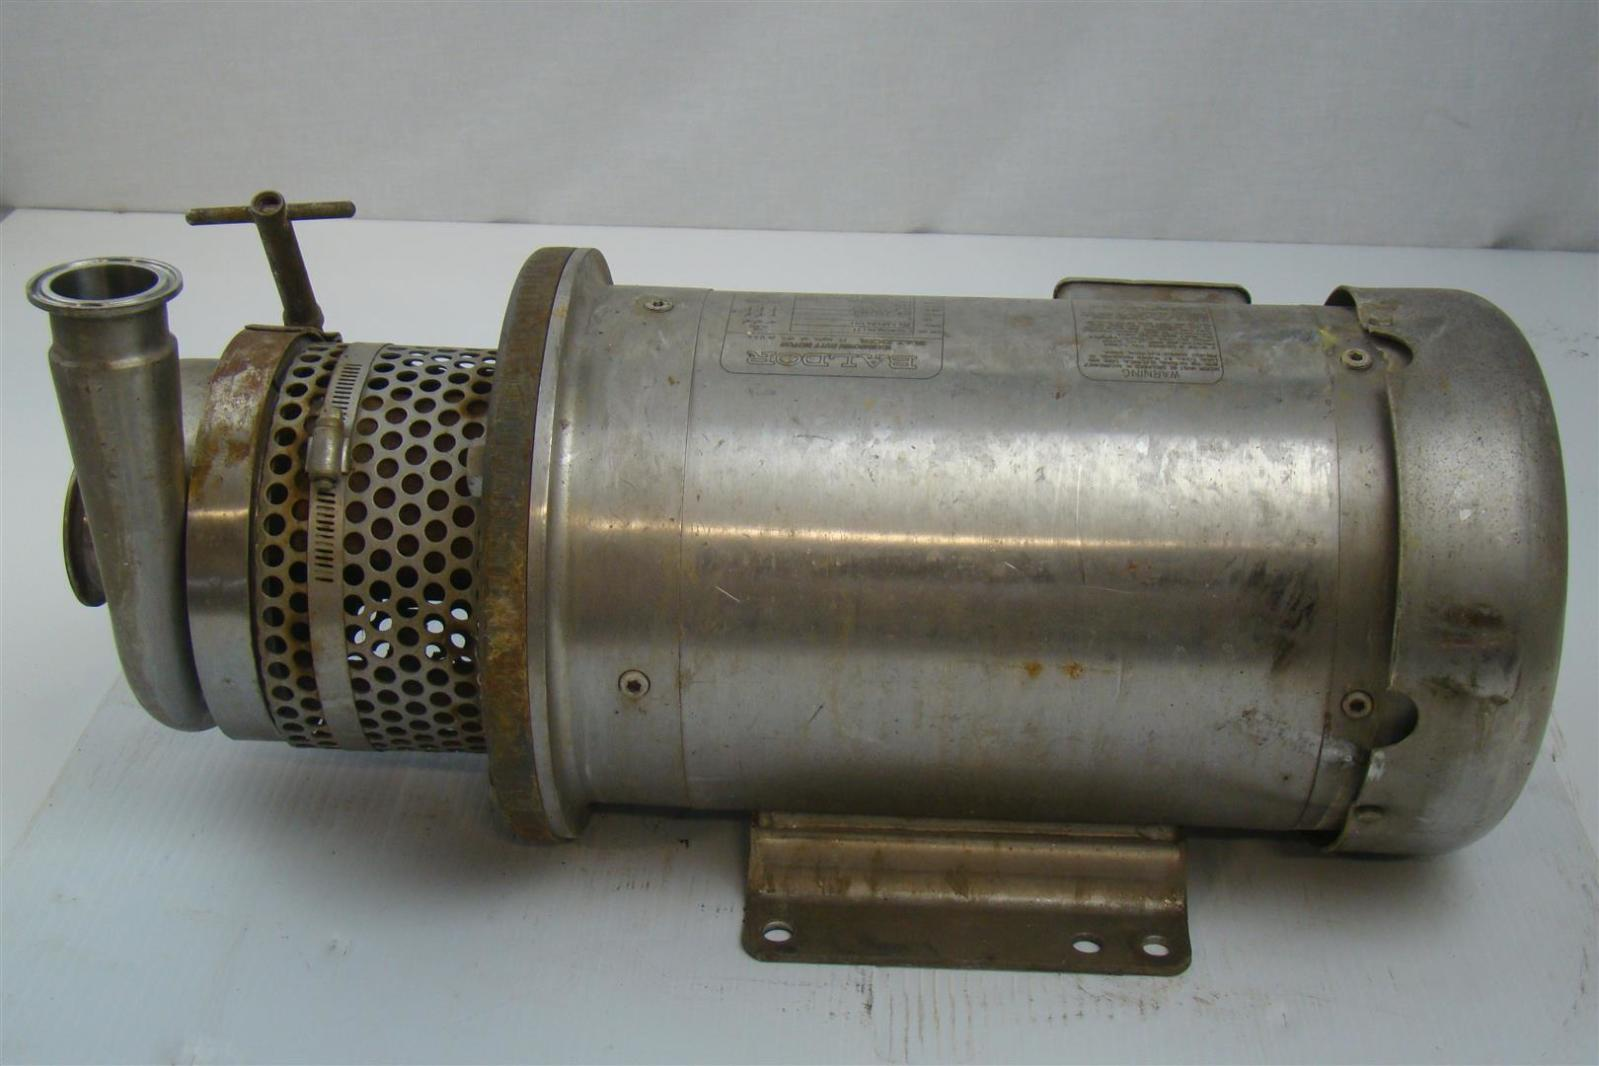 Baldor motor 5hp 208 230 460v 3450 rpm w centrifugal pump Baldor industrial motor pump